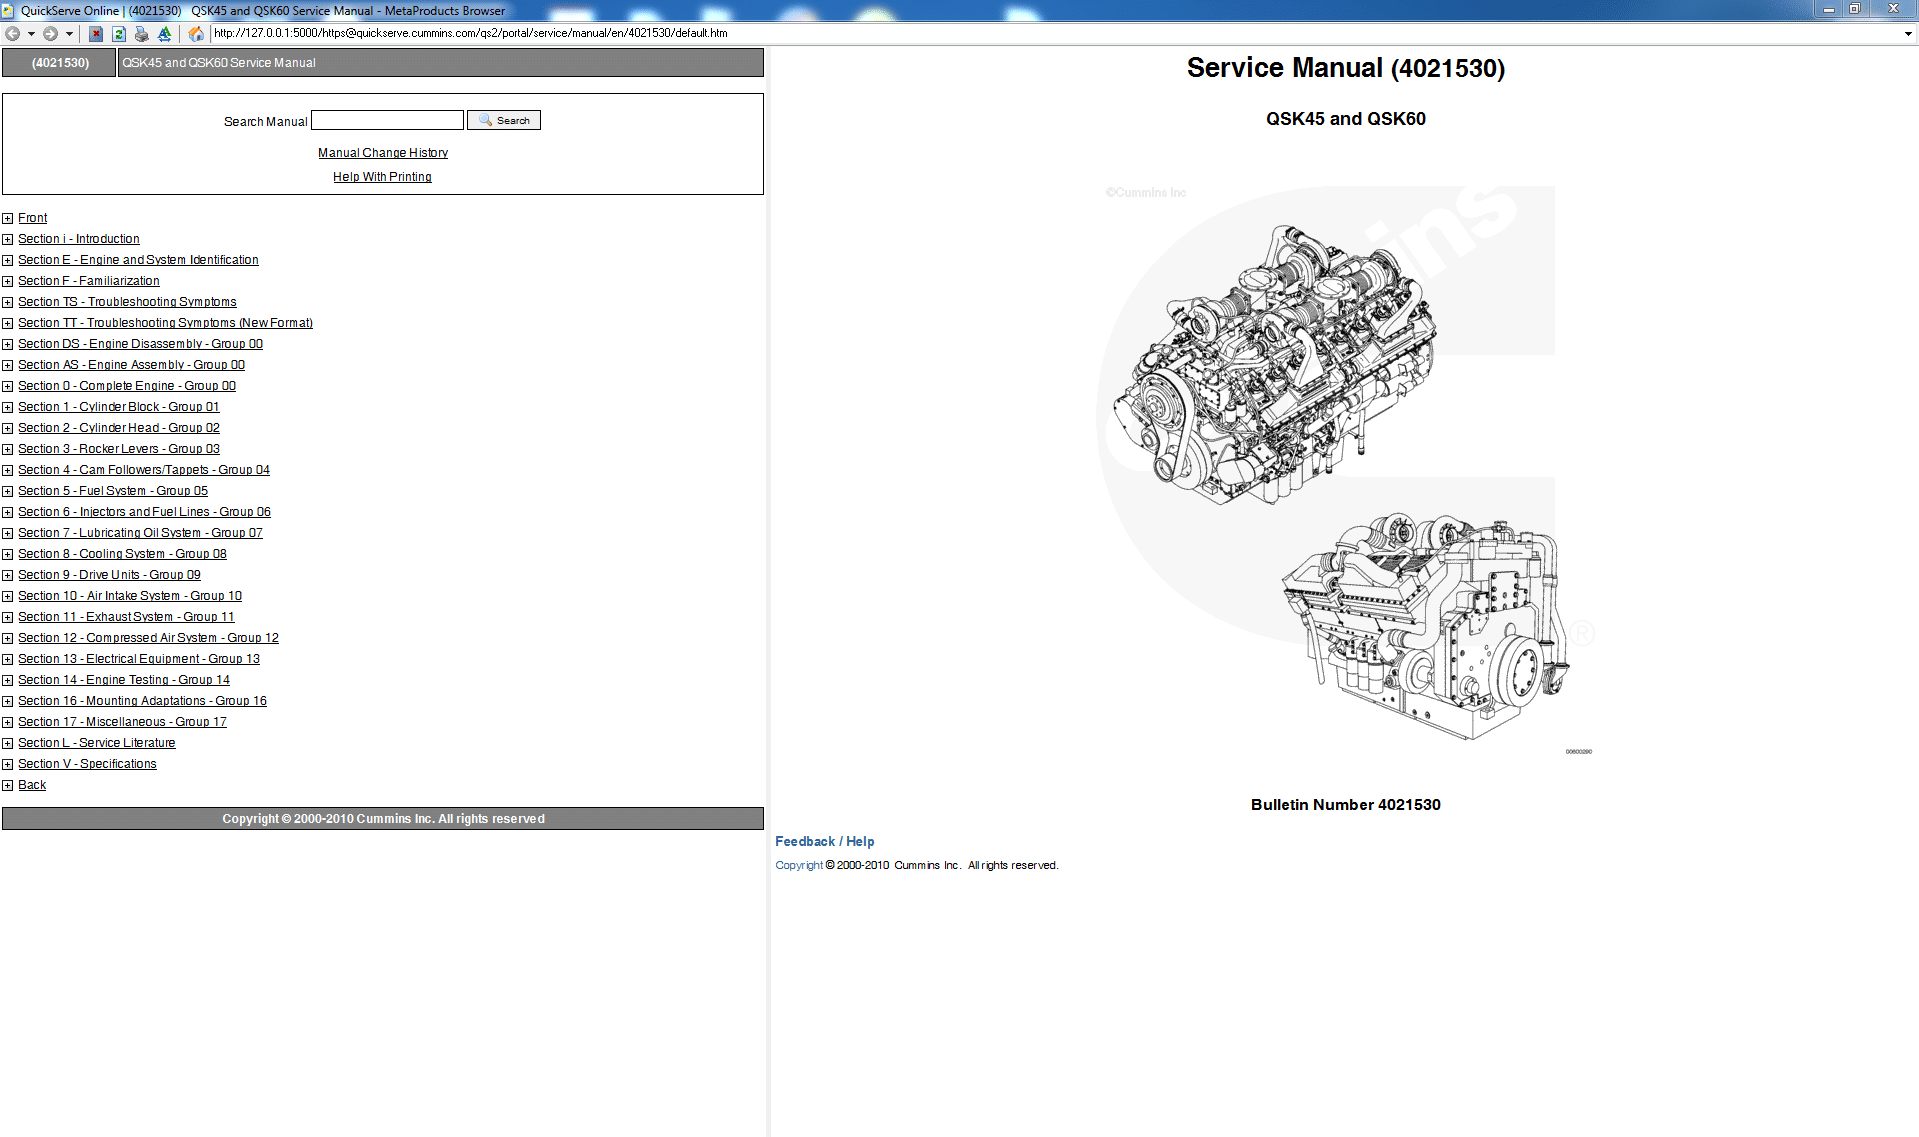 Cummins Qsk45 And Qsk60 Service Manual Pdf Download